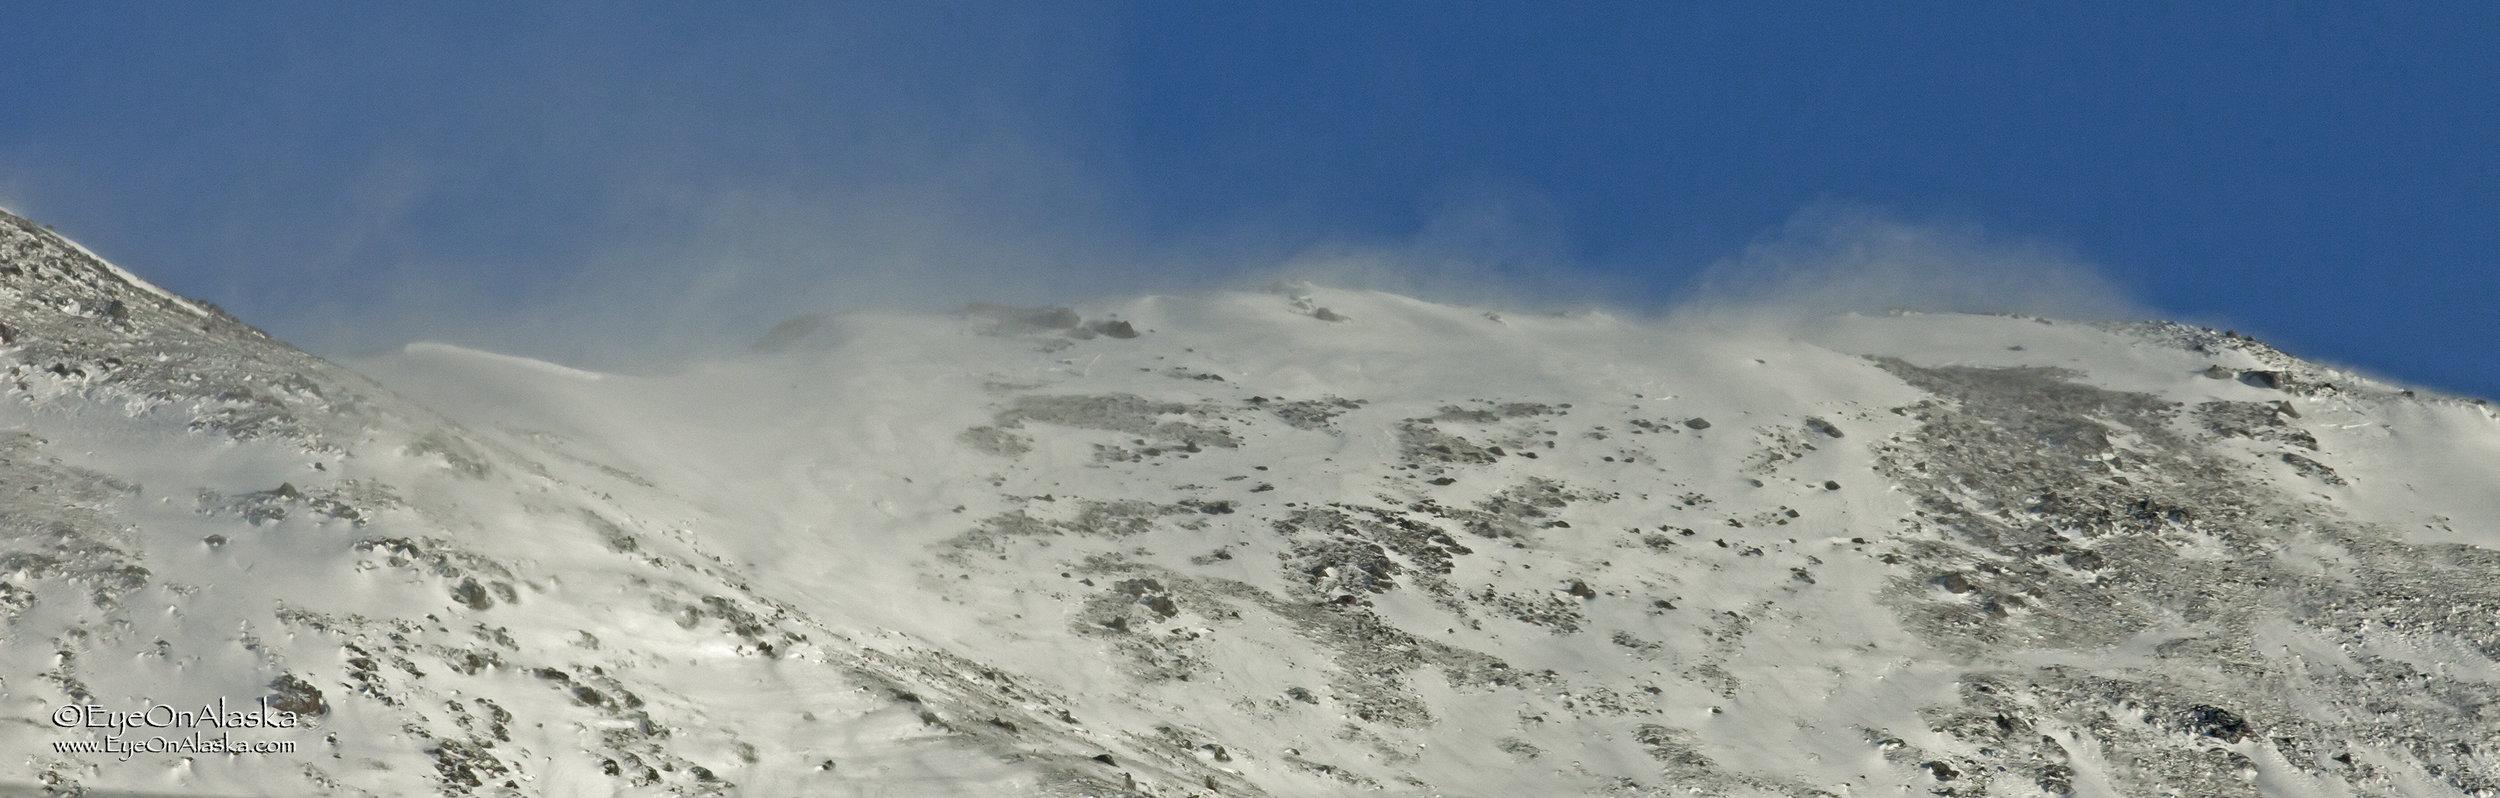 The Chugach Mountains behind the house.